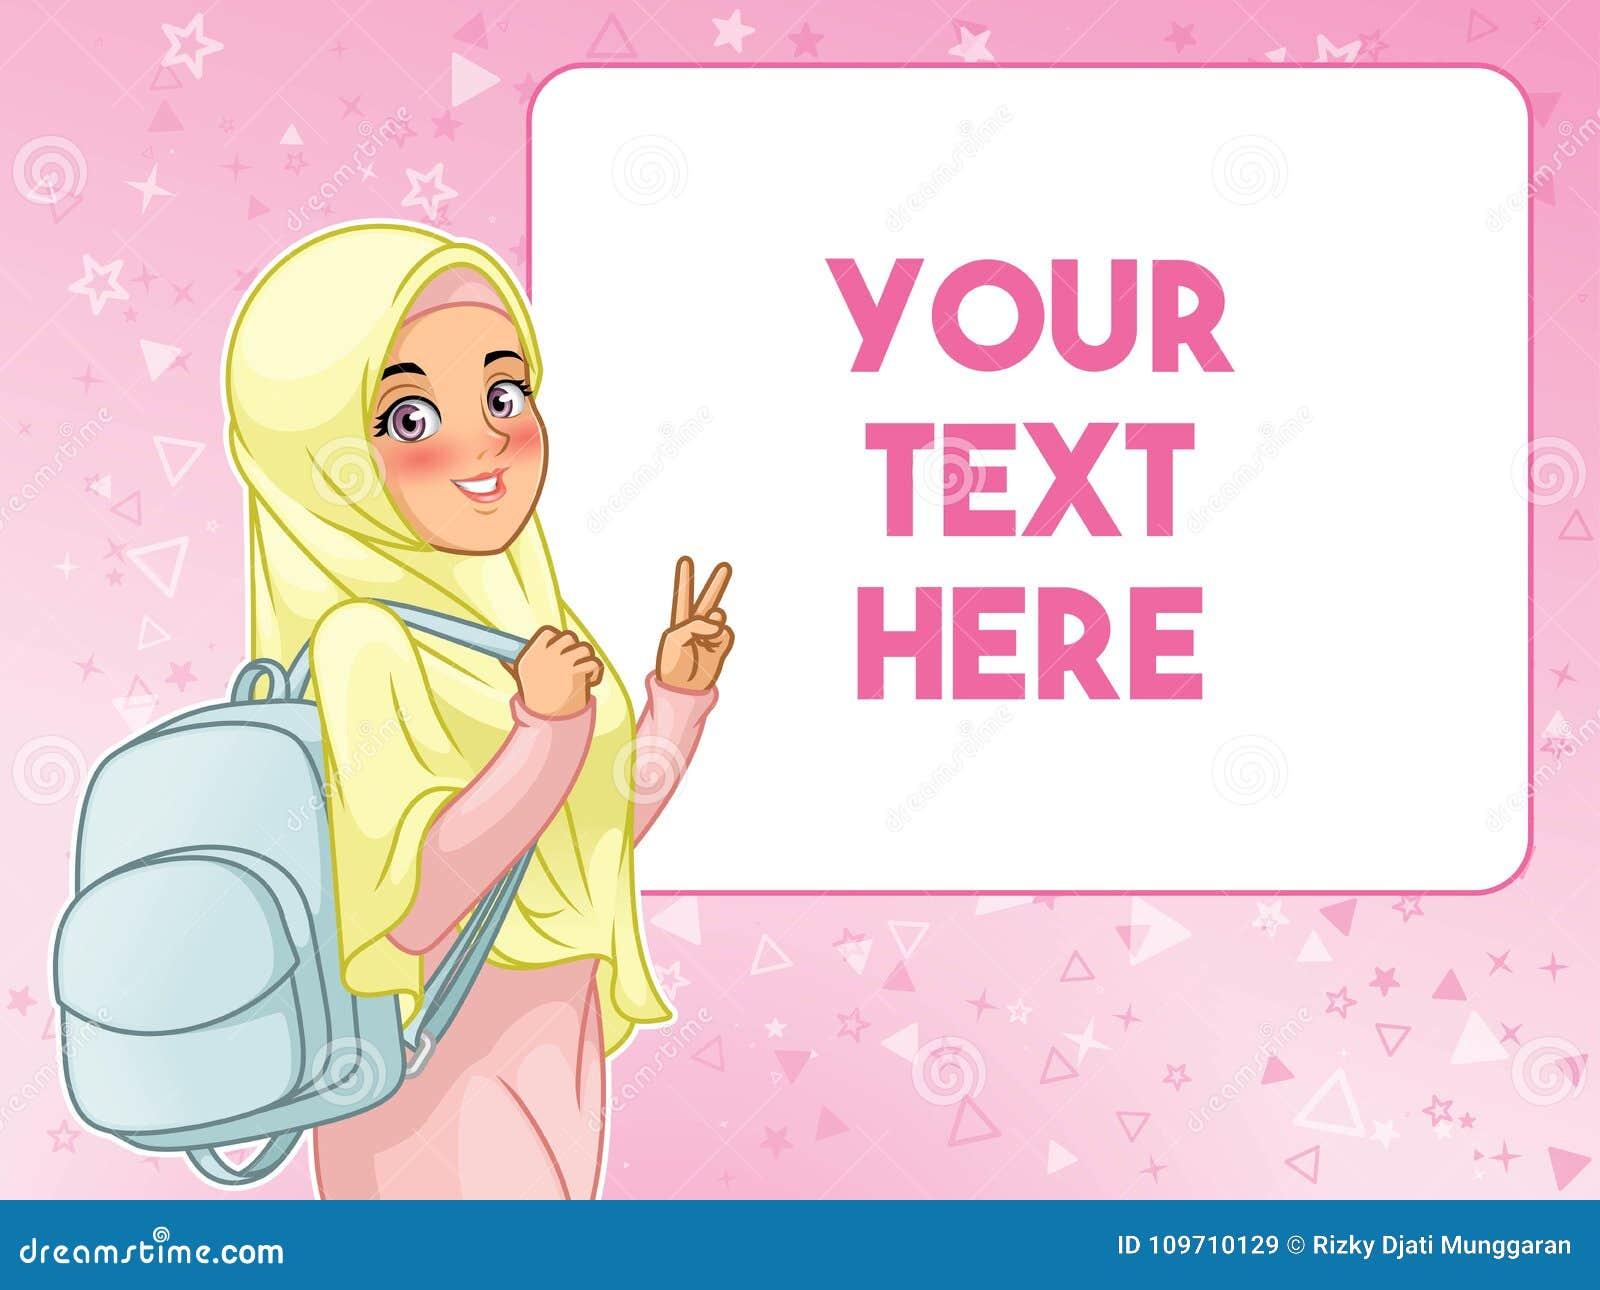 Trouxa guardando alegre muçulmana do estudante de mulher